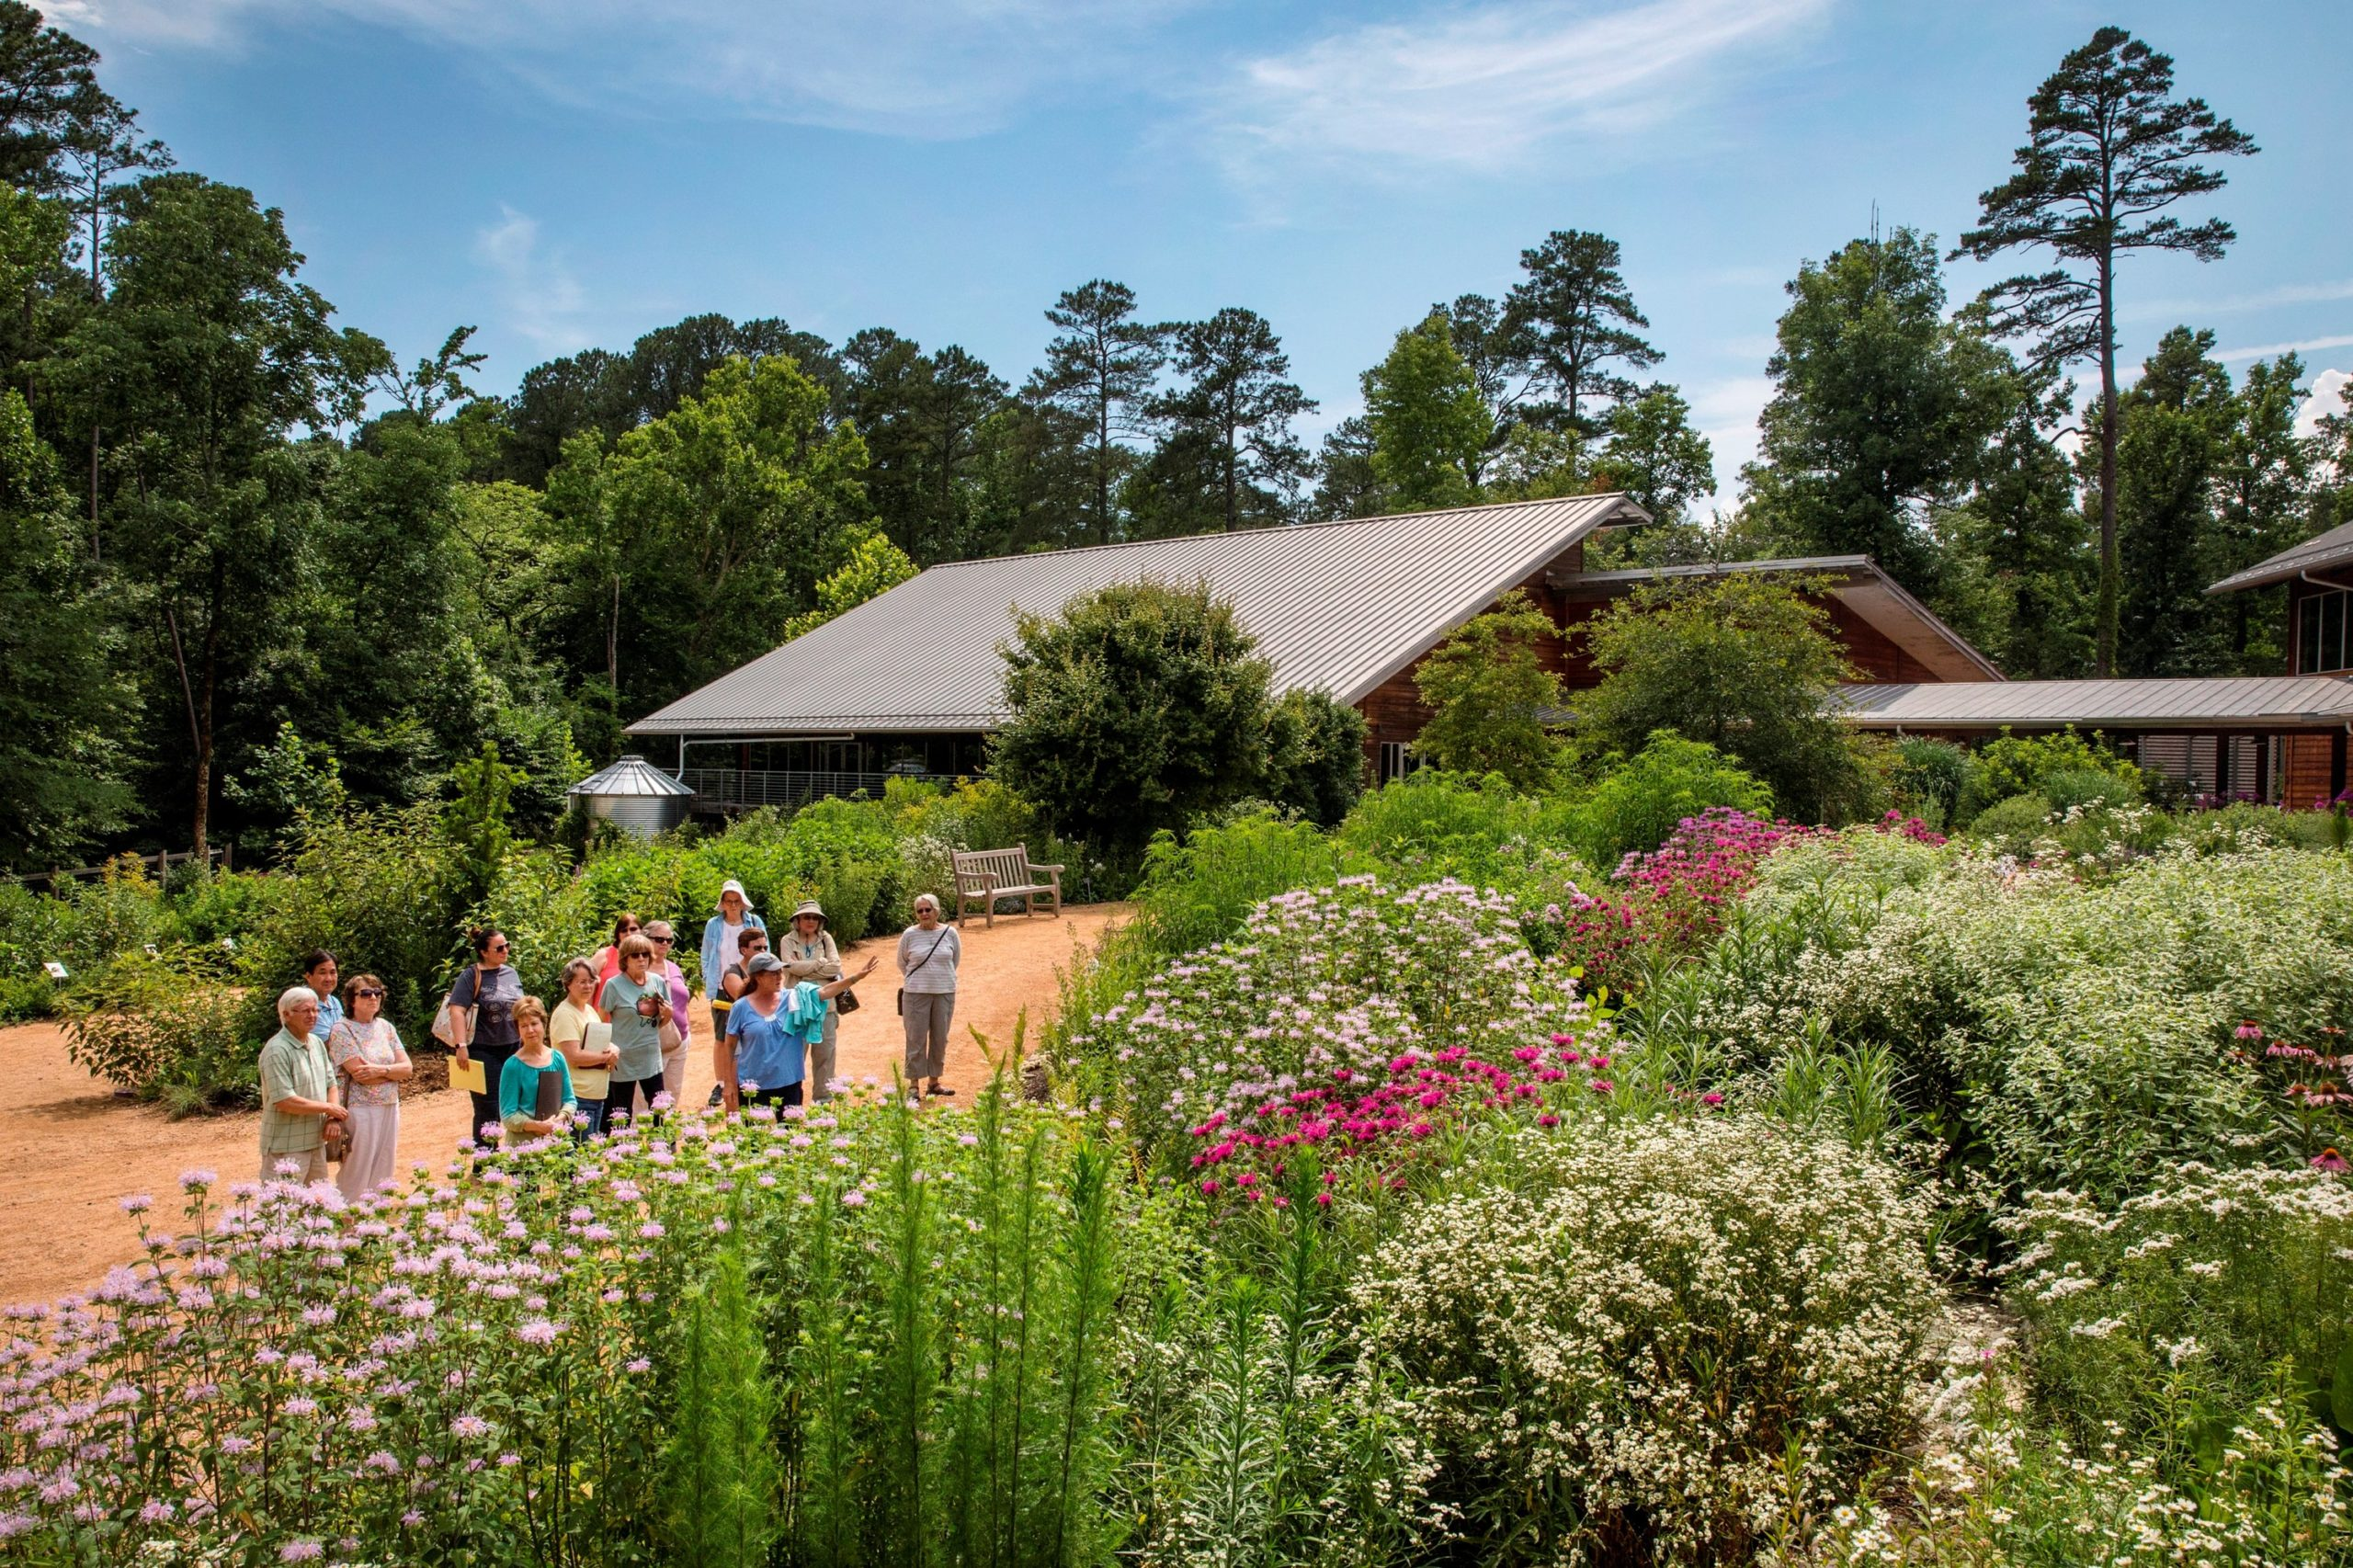 nc botanical garden evolve blog road trip spots